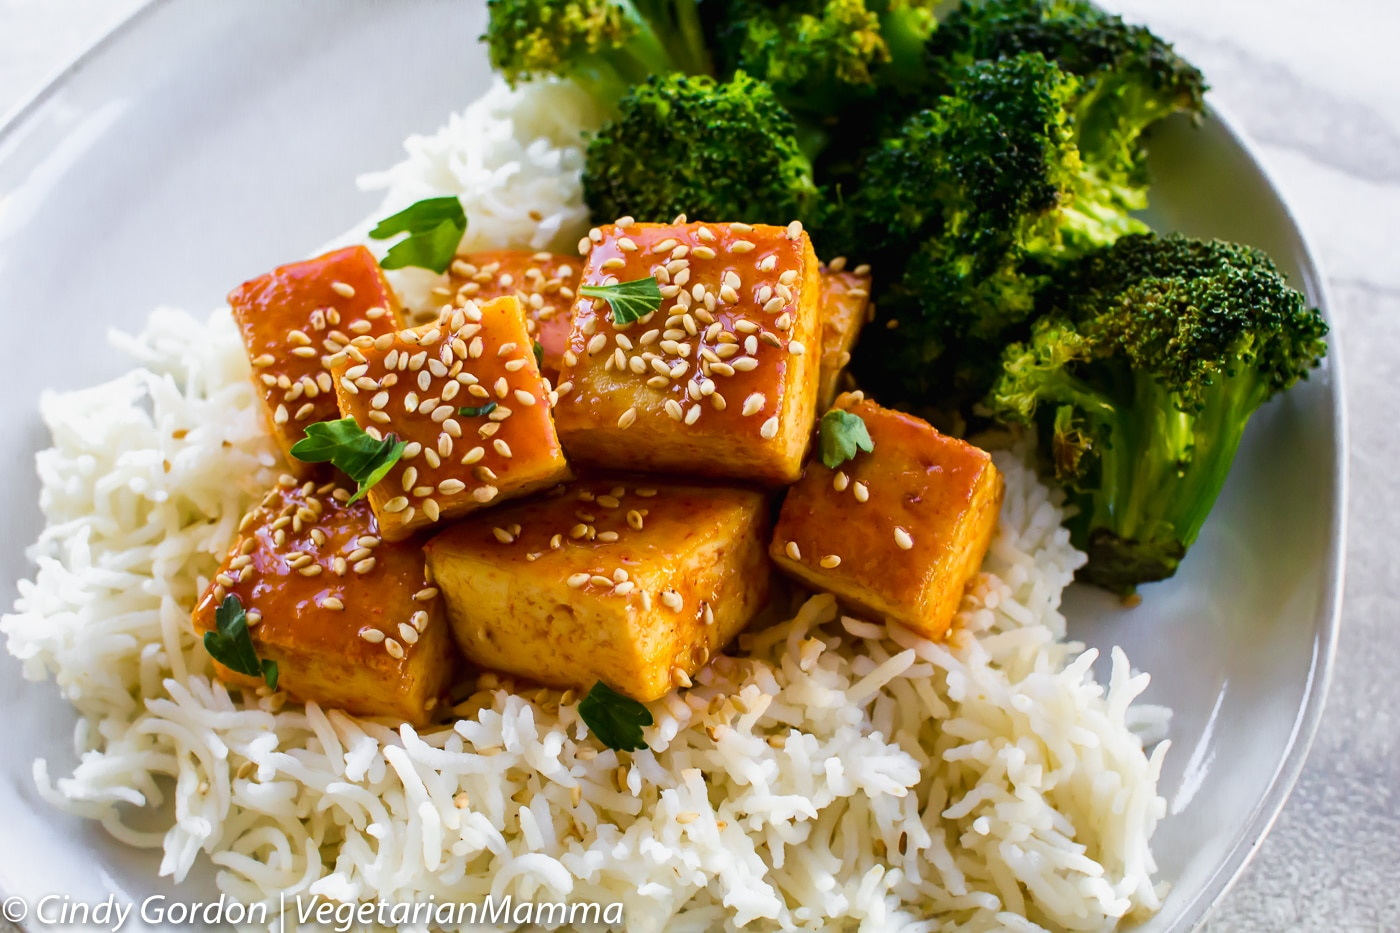 Honey Sriracha Tofu served with rice and broccoli on a white plate